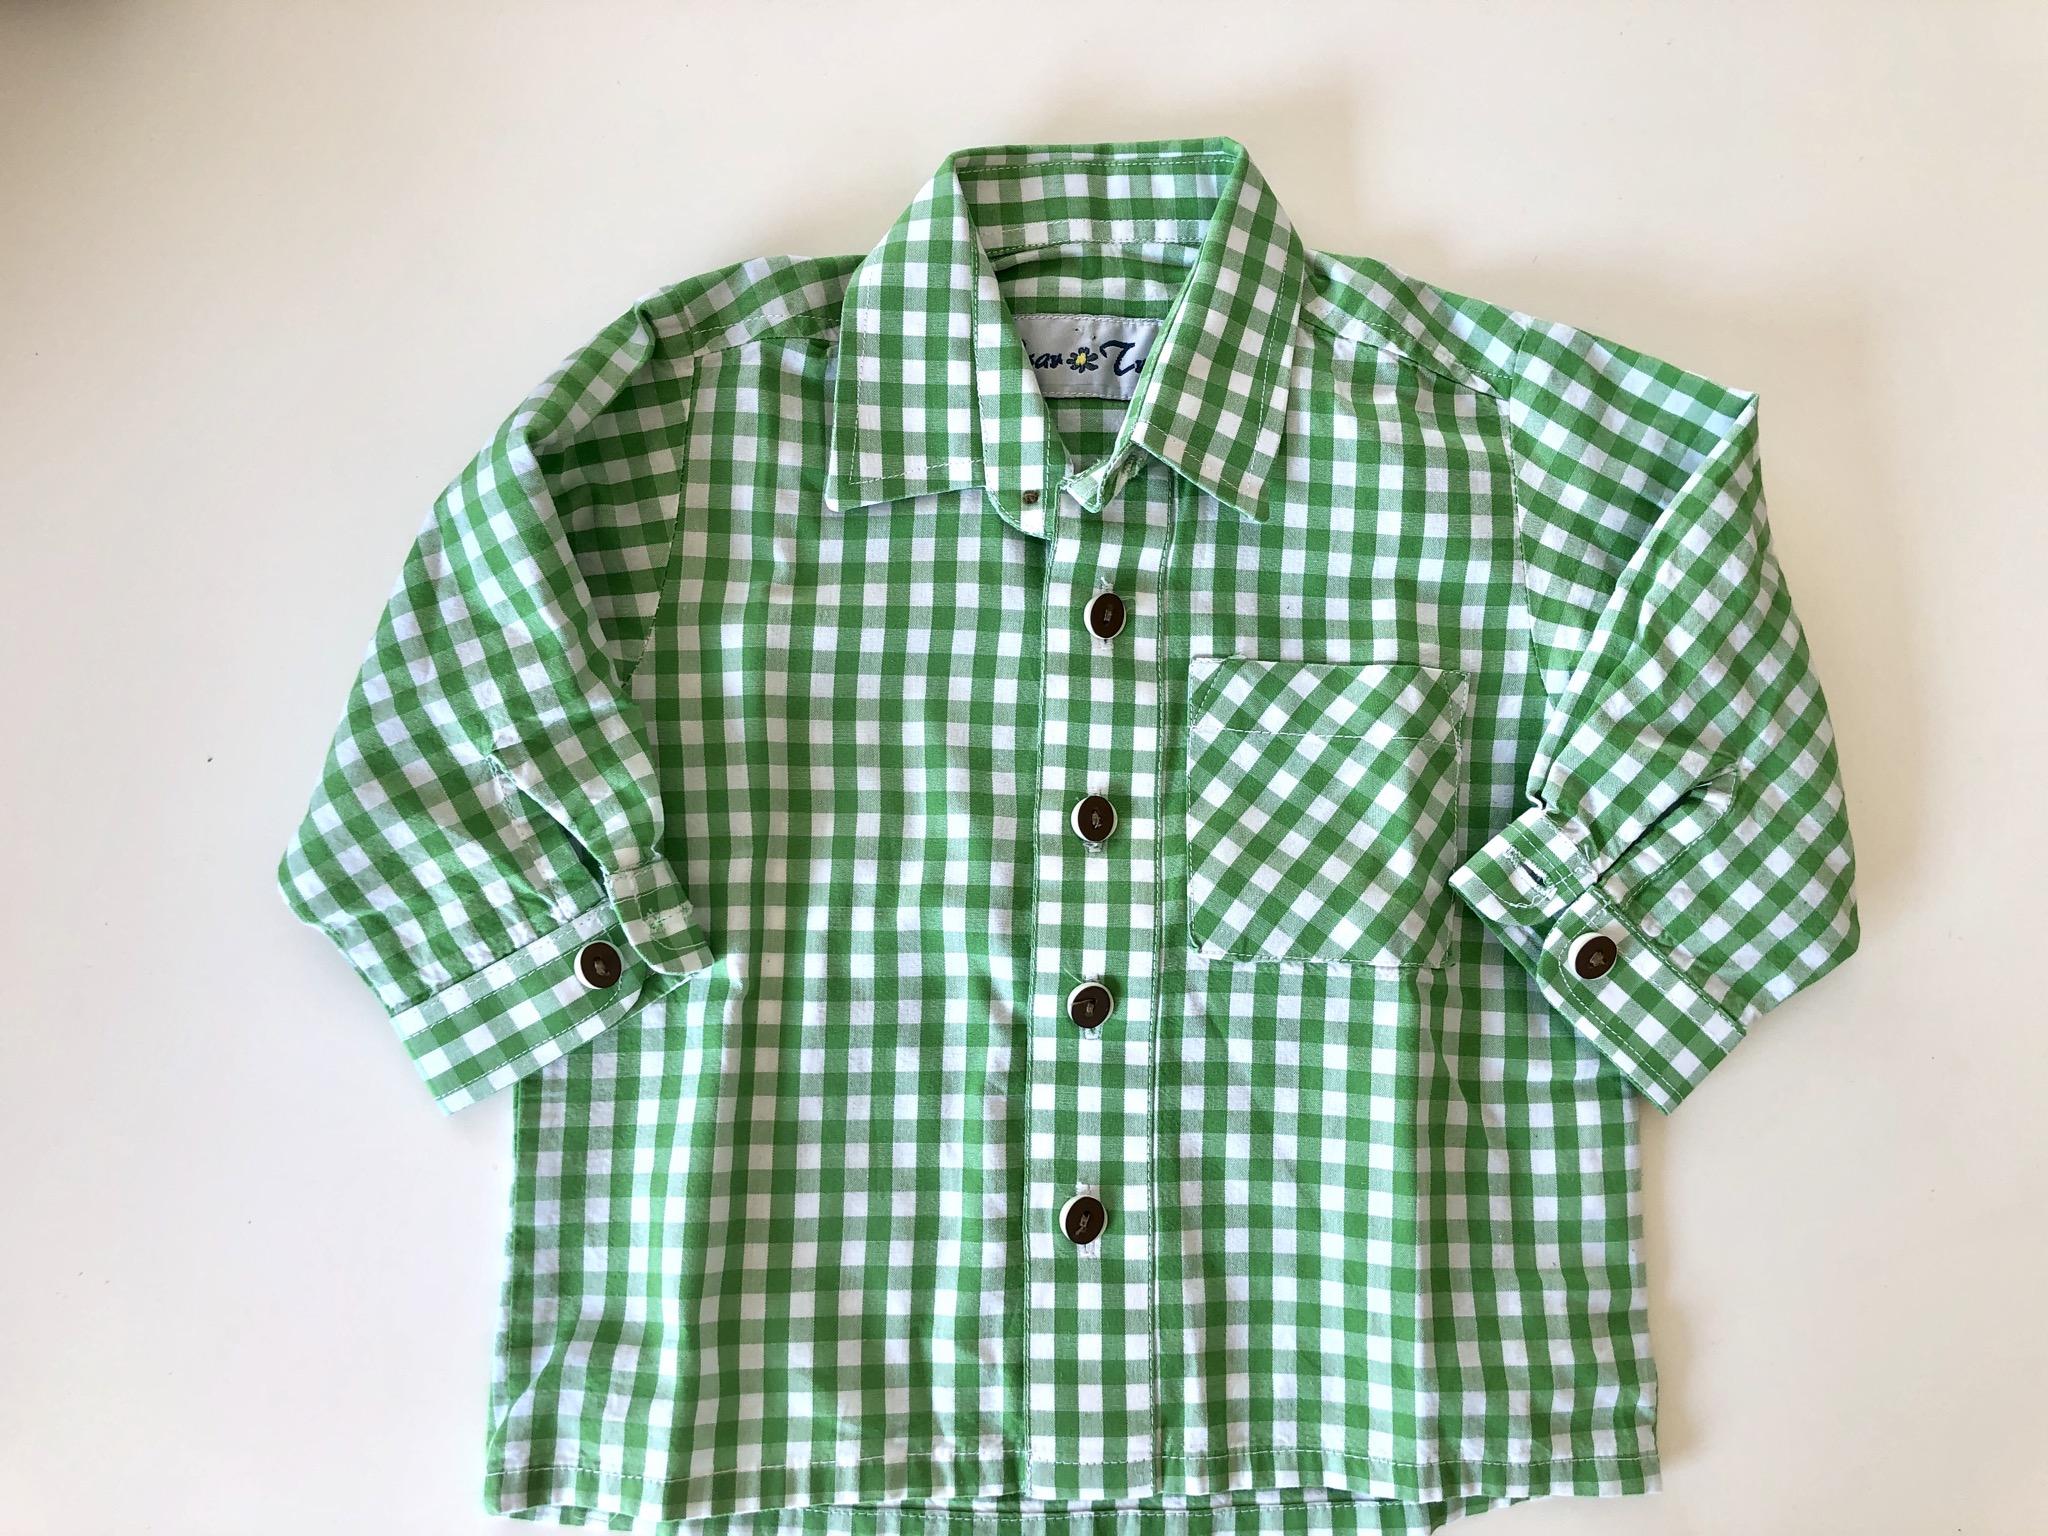 Gr. 80 Isar Trachten Trachtenhemd grün